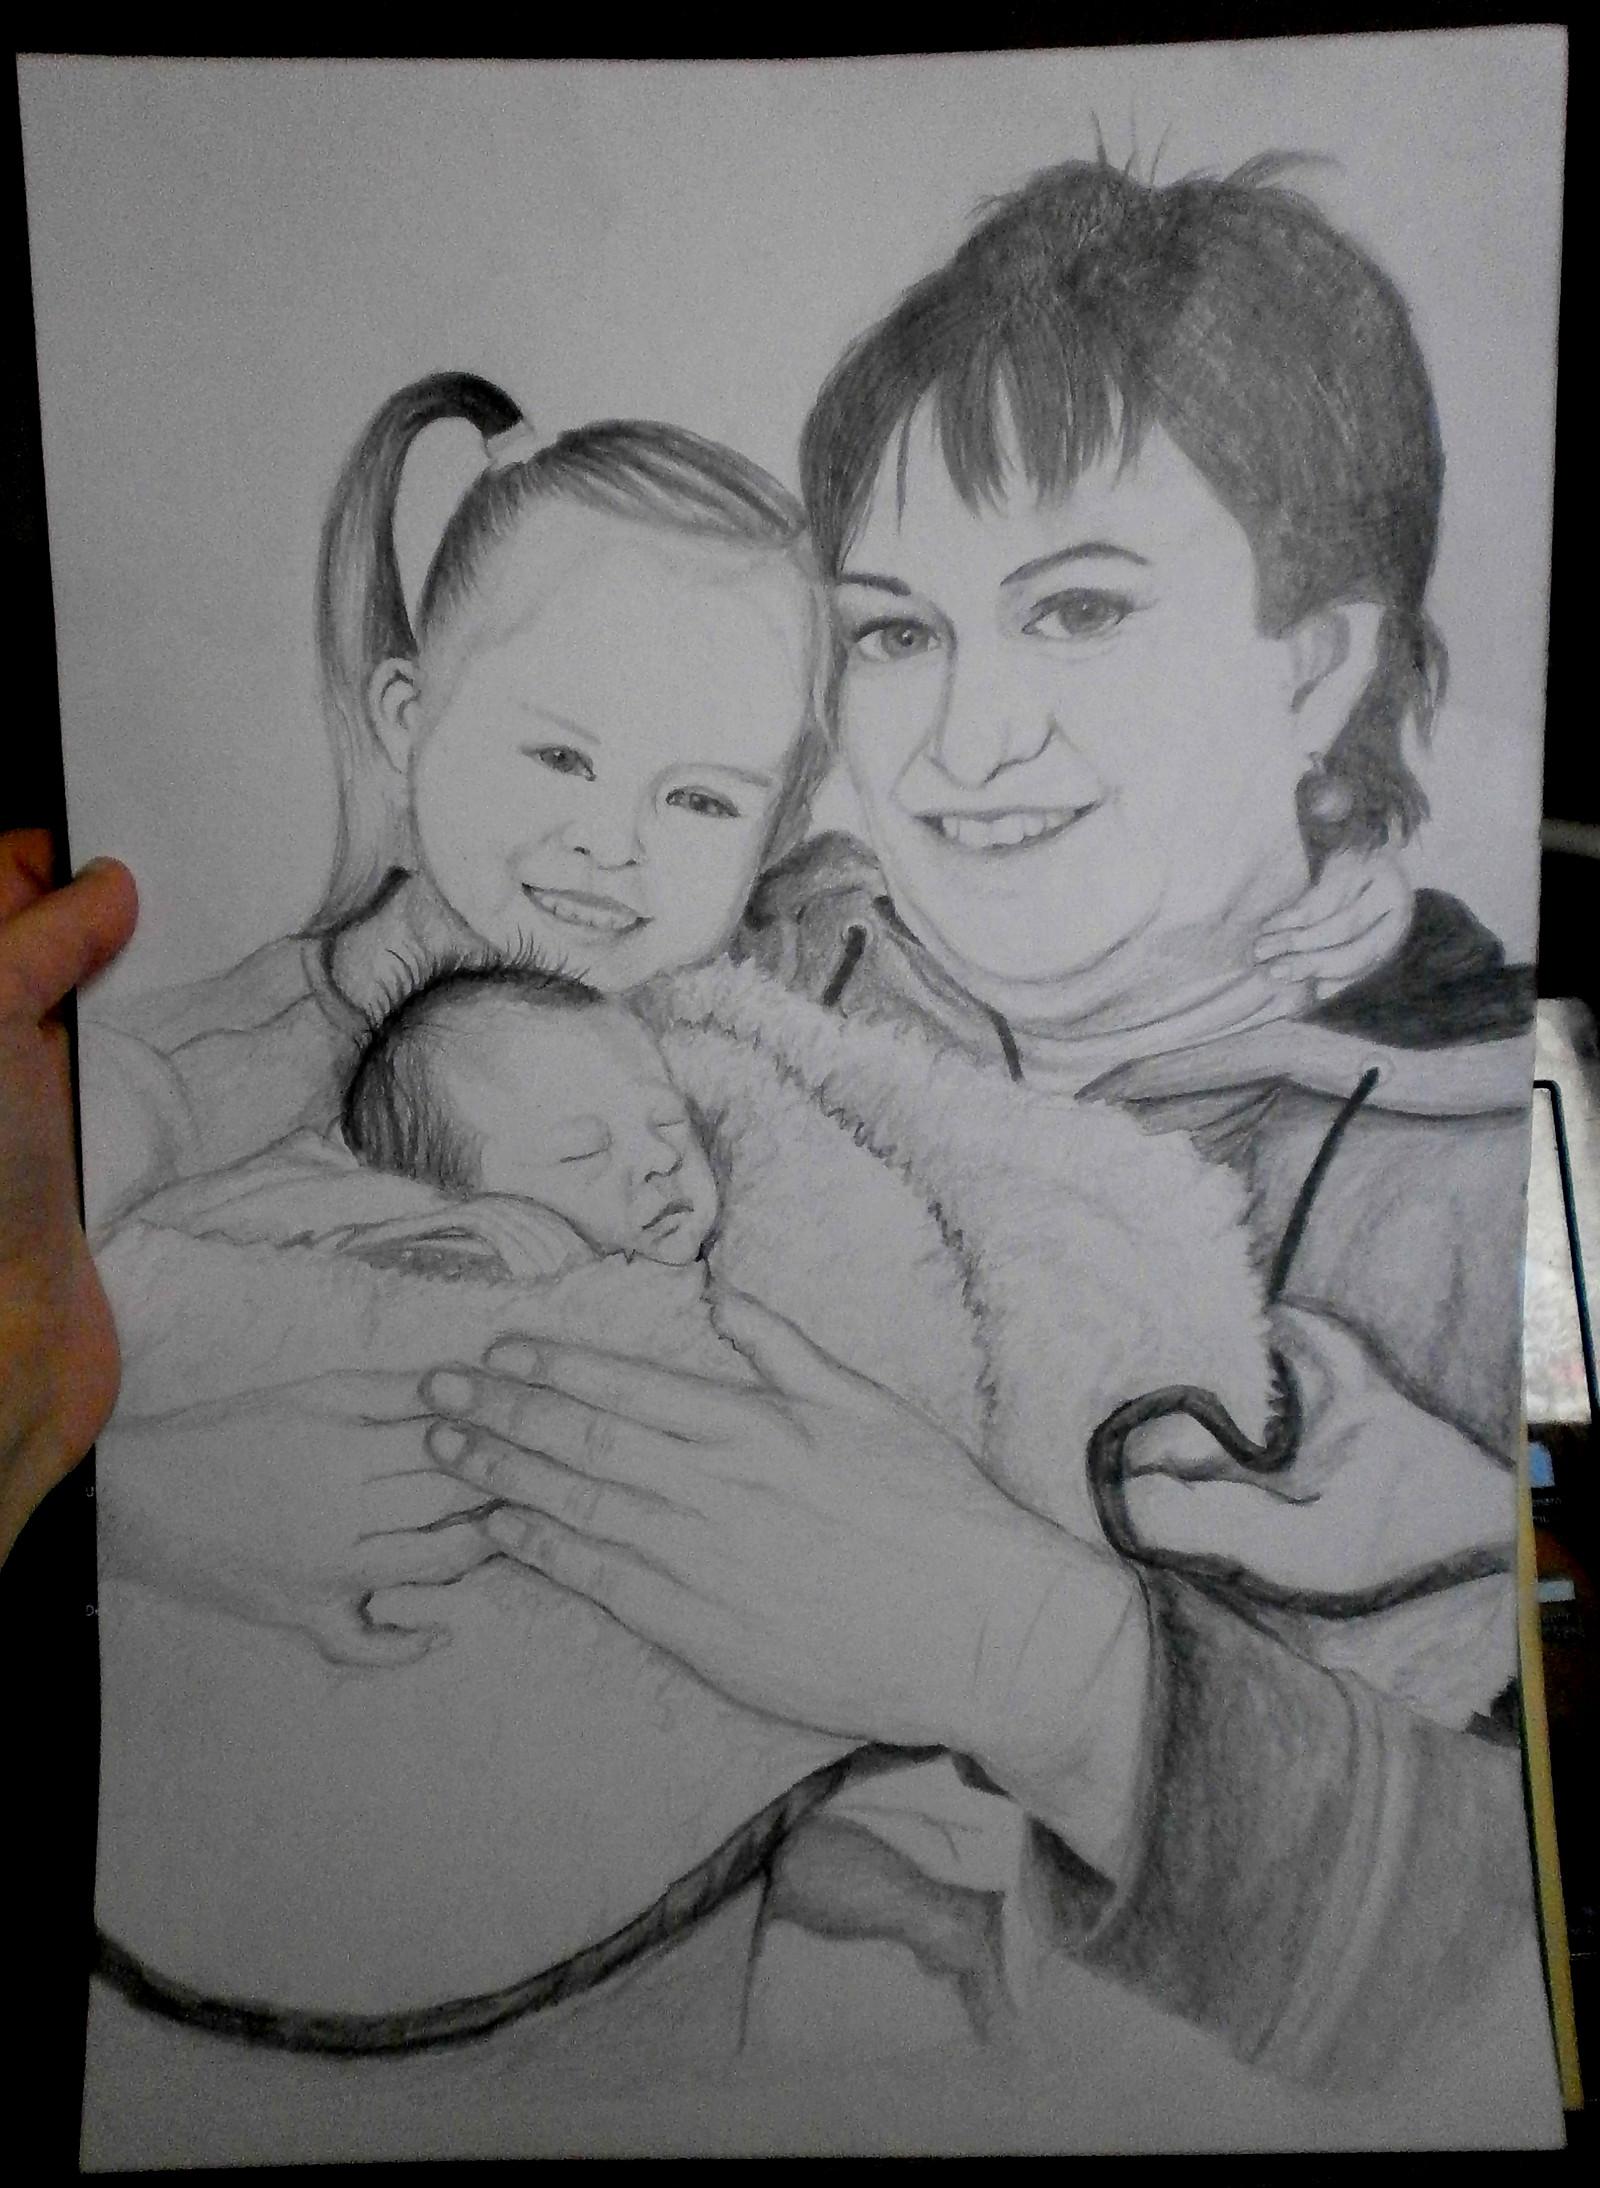 Portret Dle Vasi Fotografie Kresba Tuzkou Format A3 Zbozi